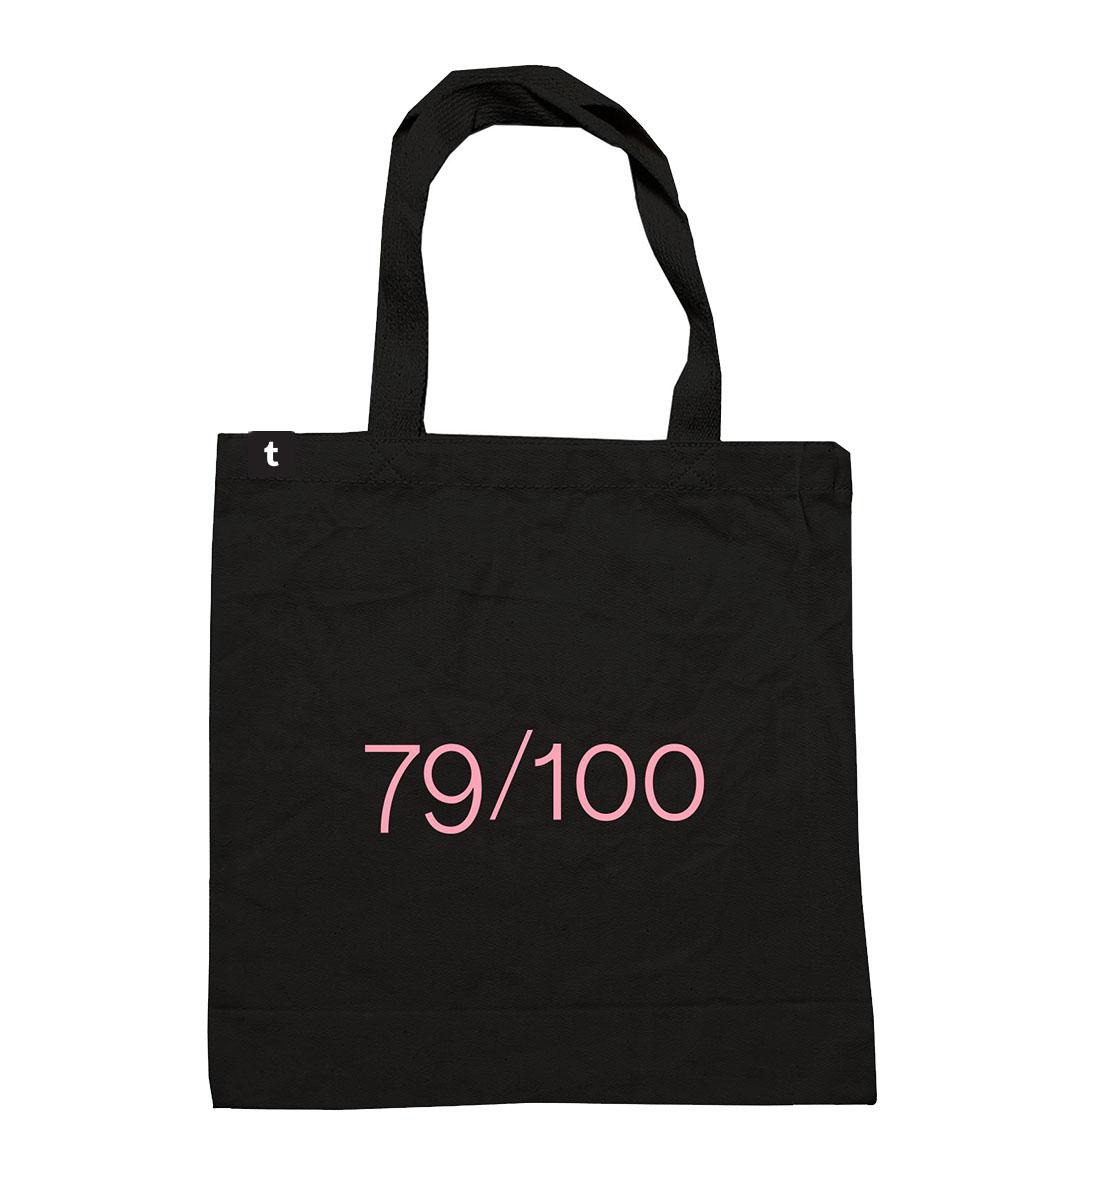 Tumblr - 79/100 Tote